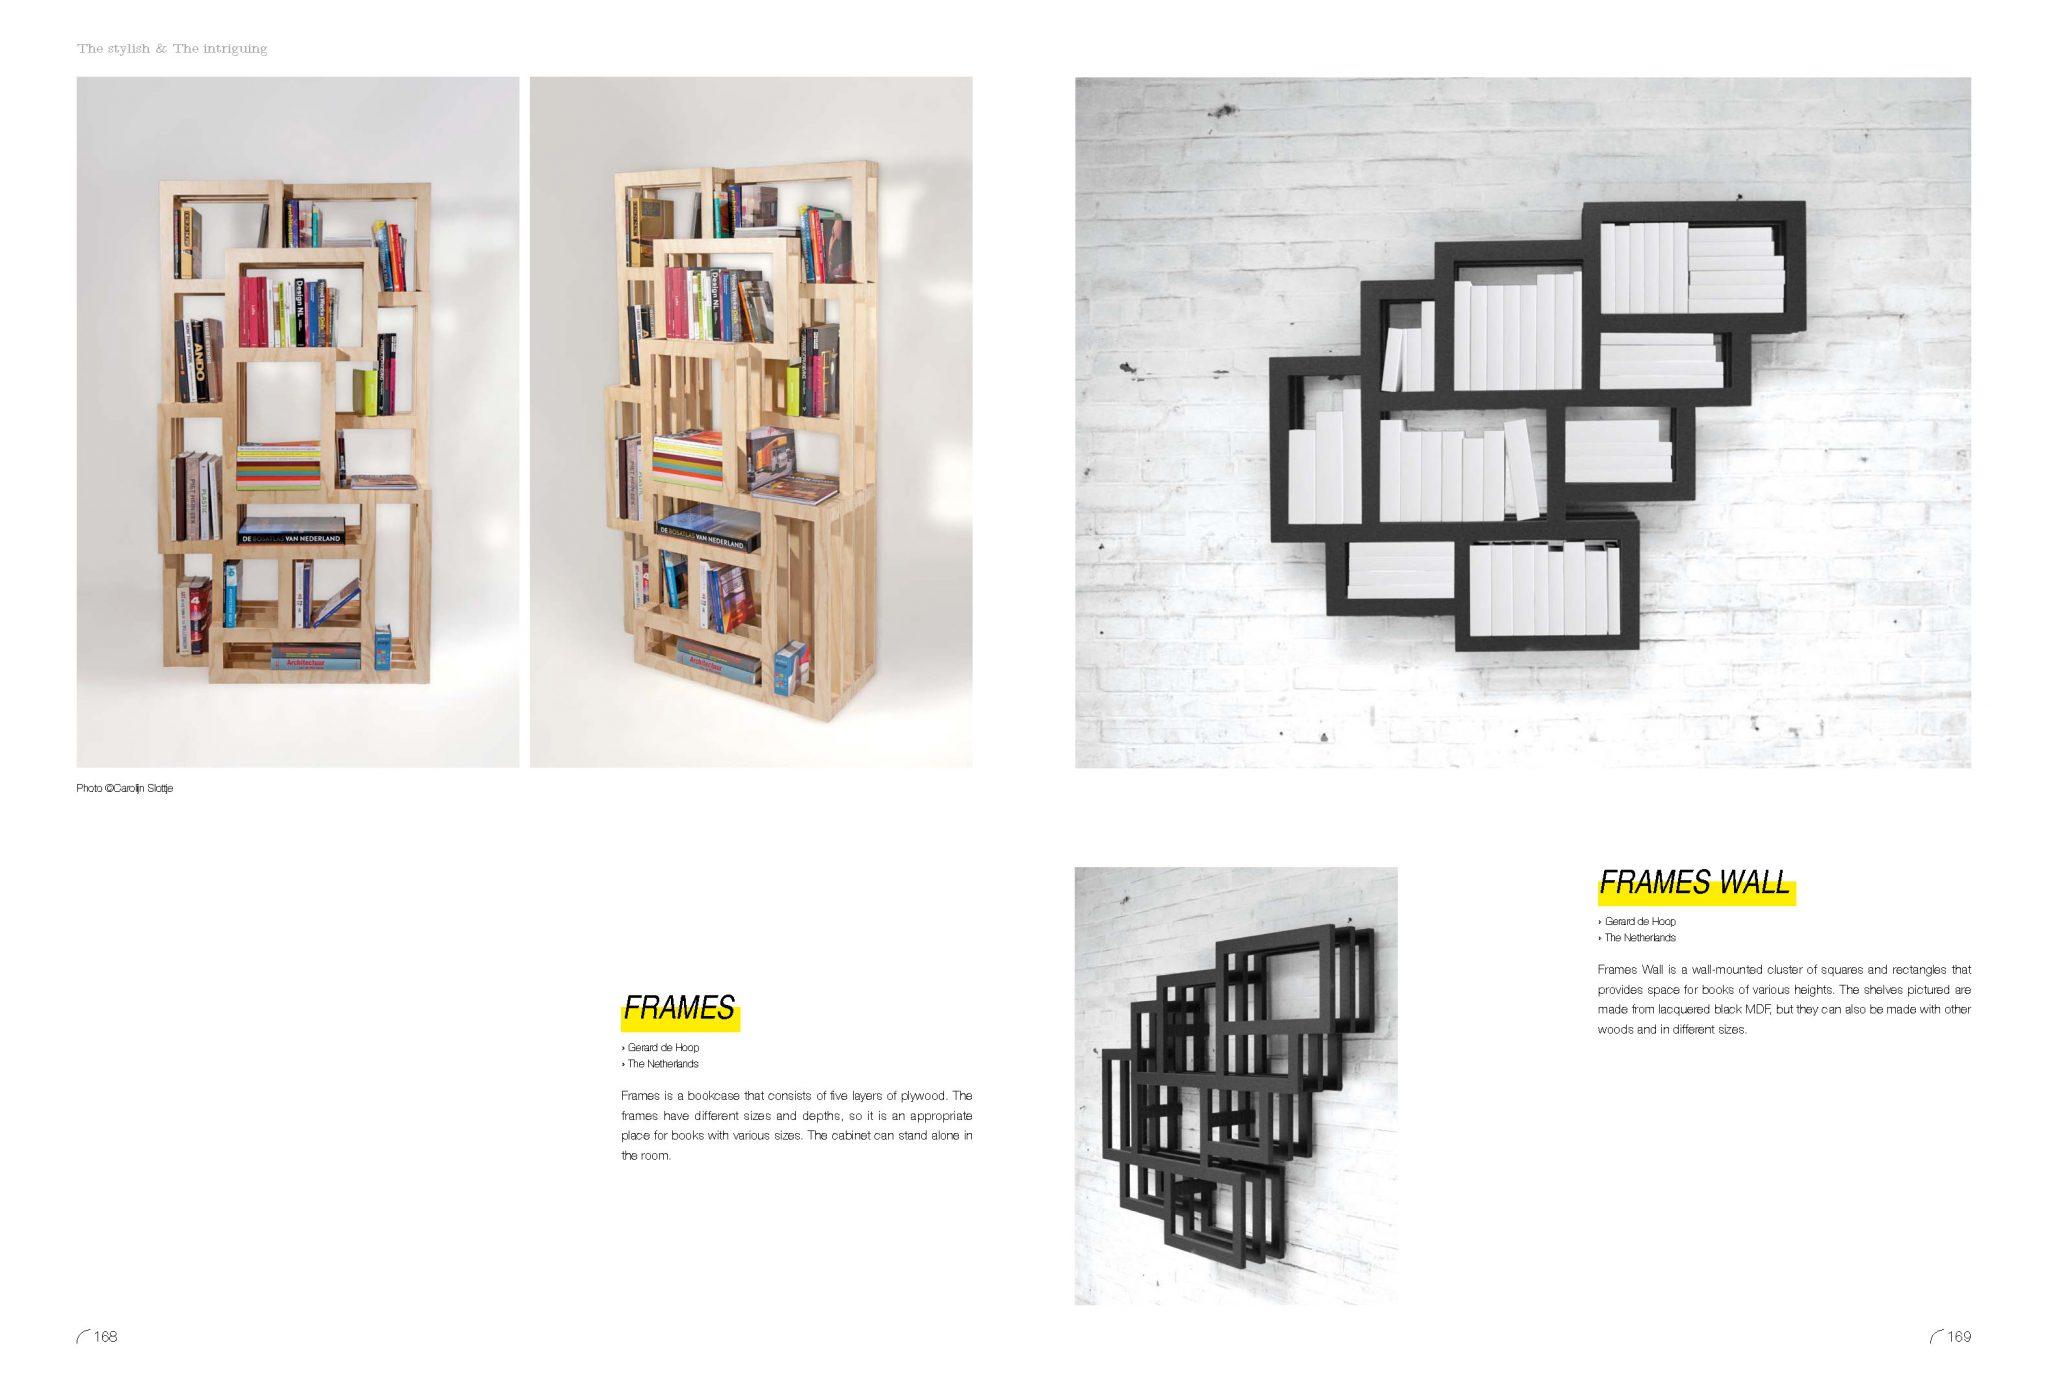 Pages from Bookshelf Design Frames